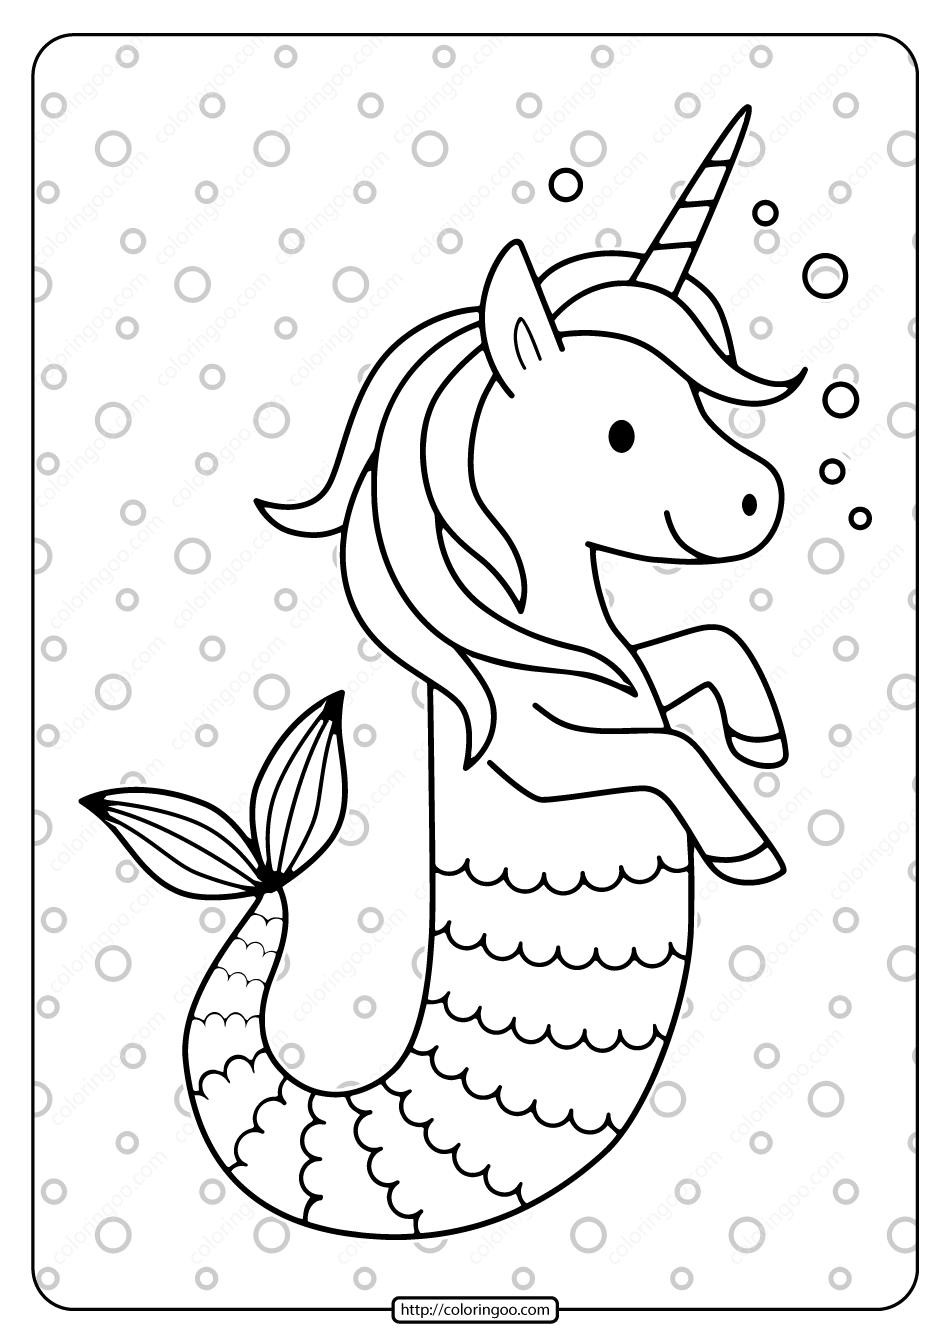 Free Printable Unicorn Seahorse Pdf Coloring Page. High quality